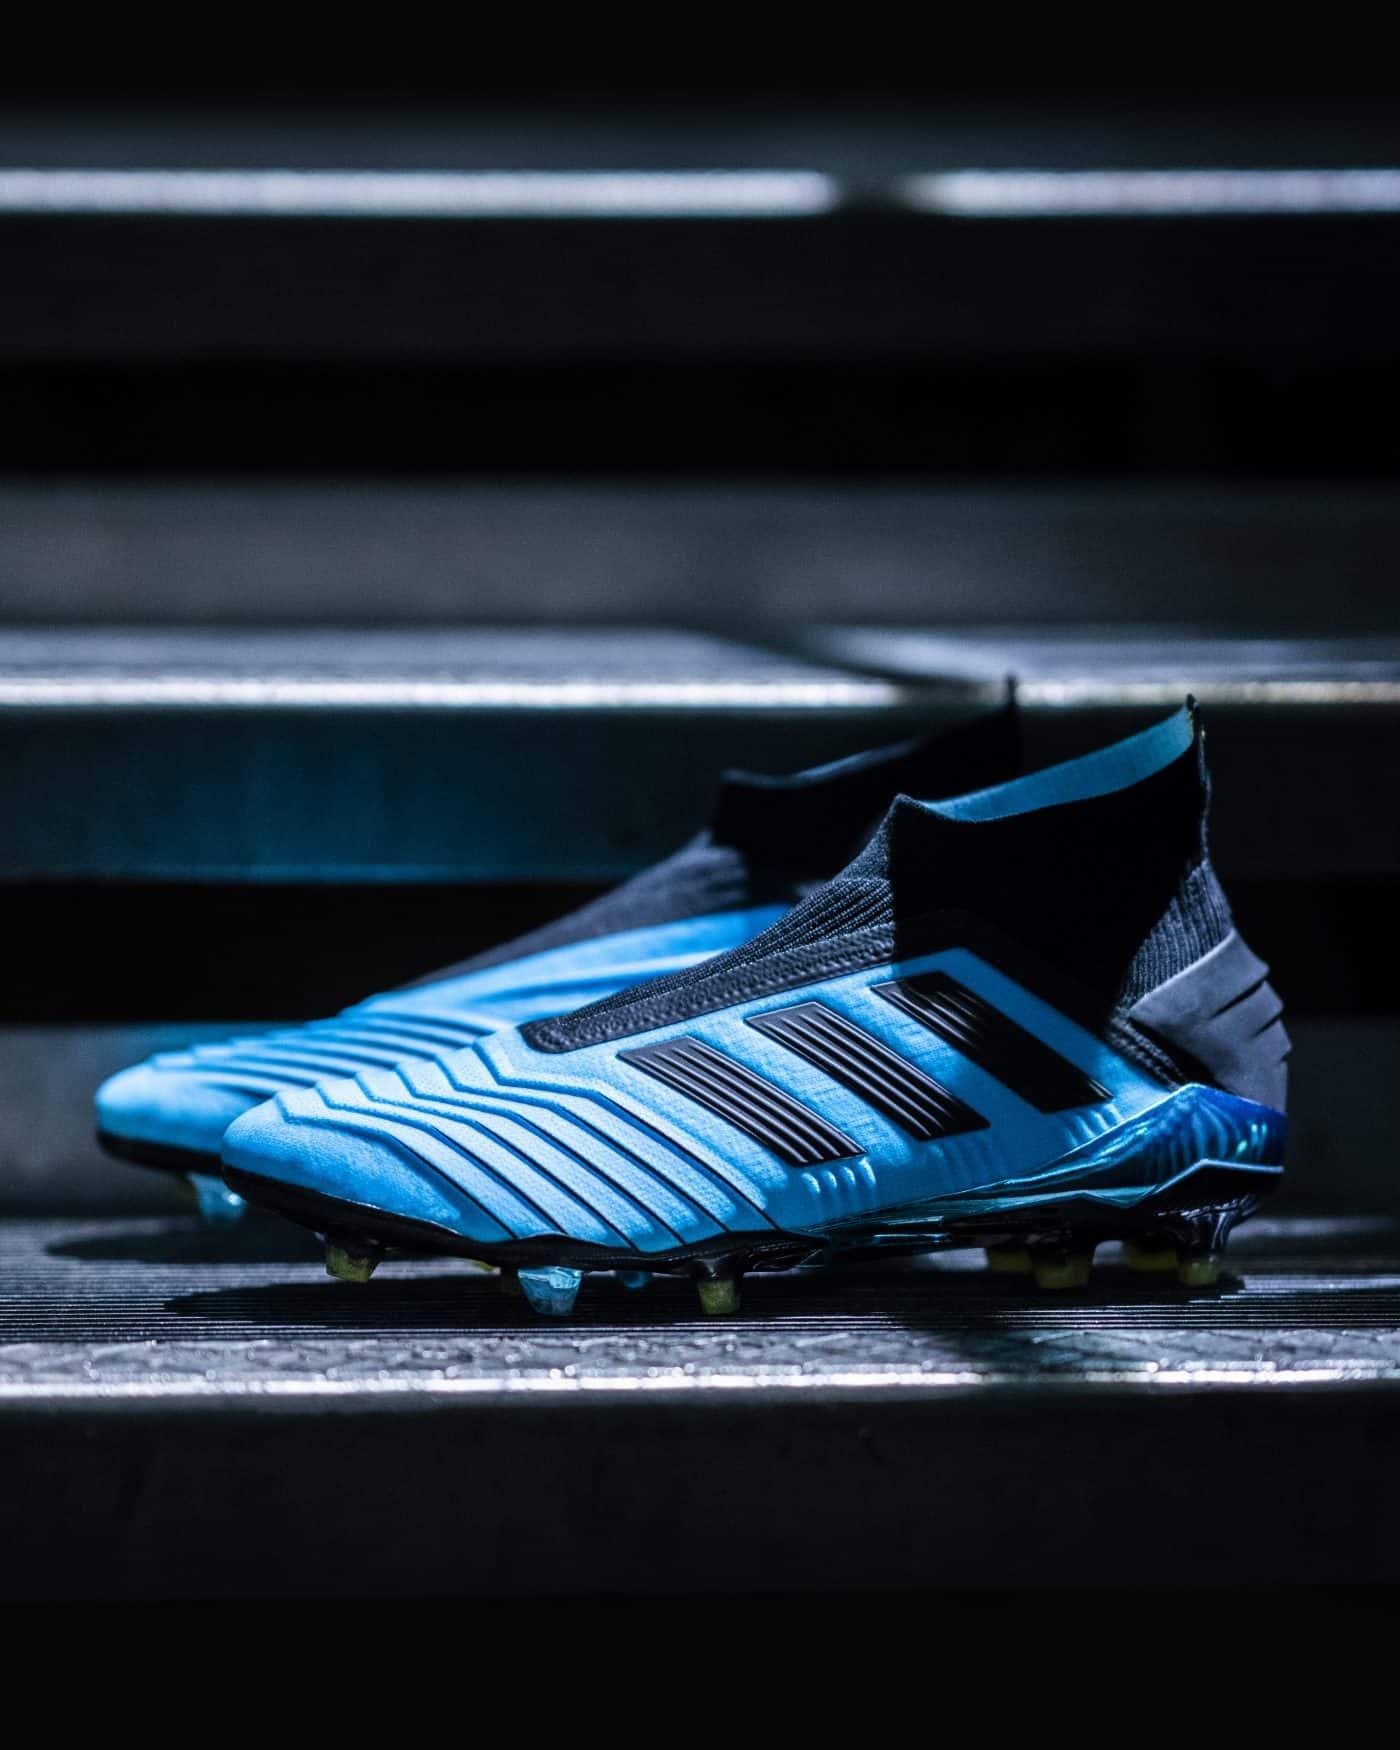 adidas-predator-19-pack-hard-wired-juillet-2019-5